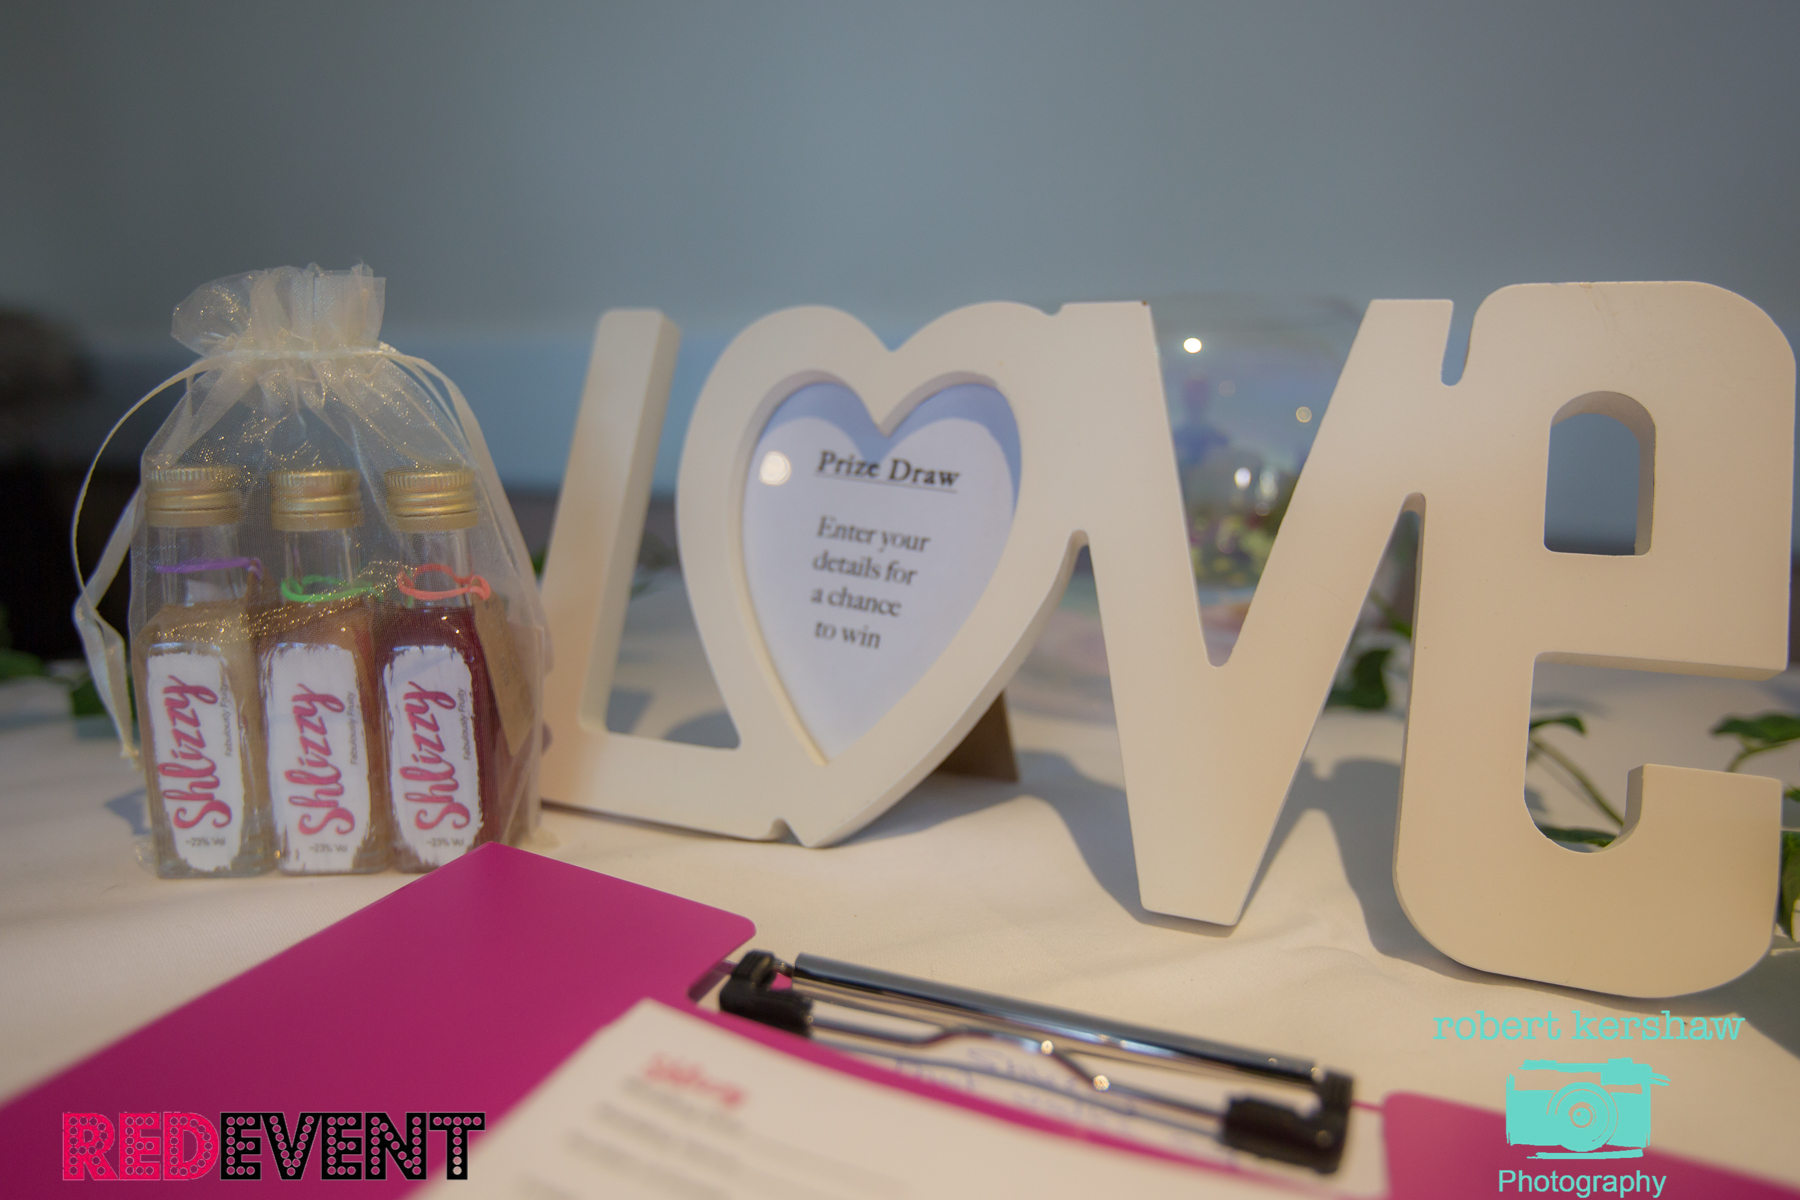 www.redeventweddingfayres.com